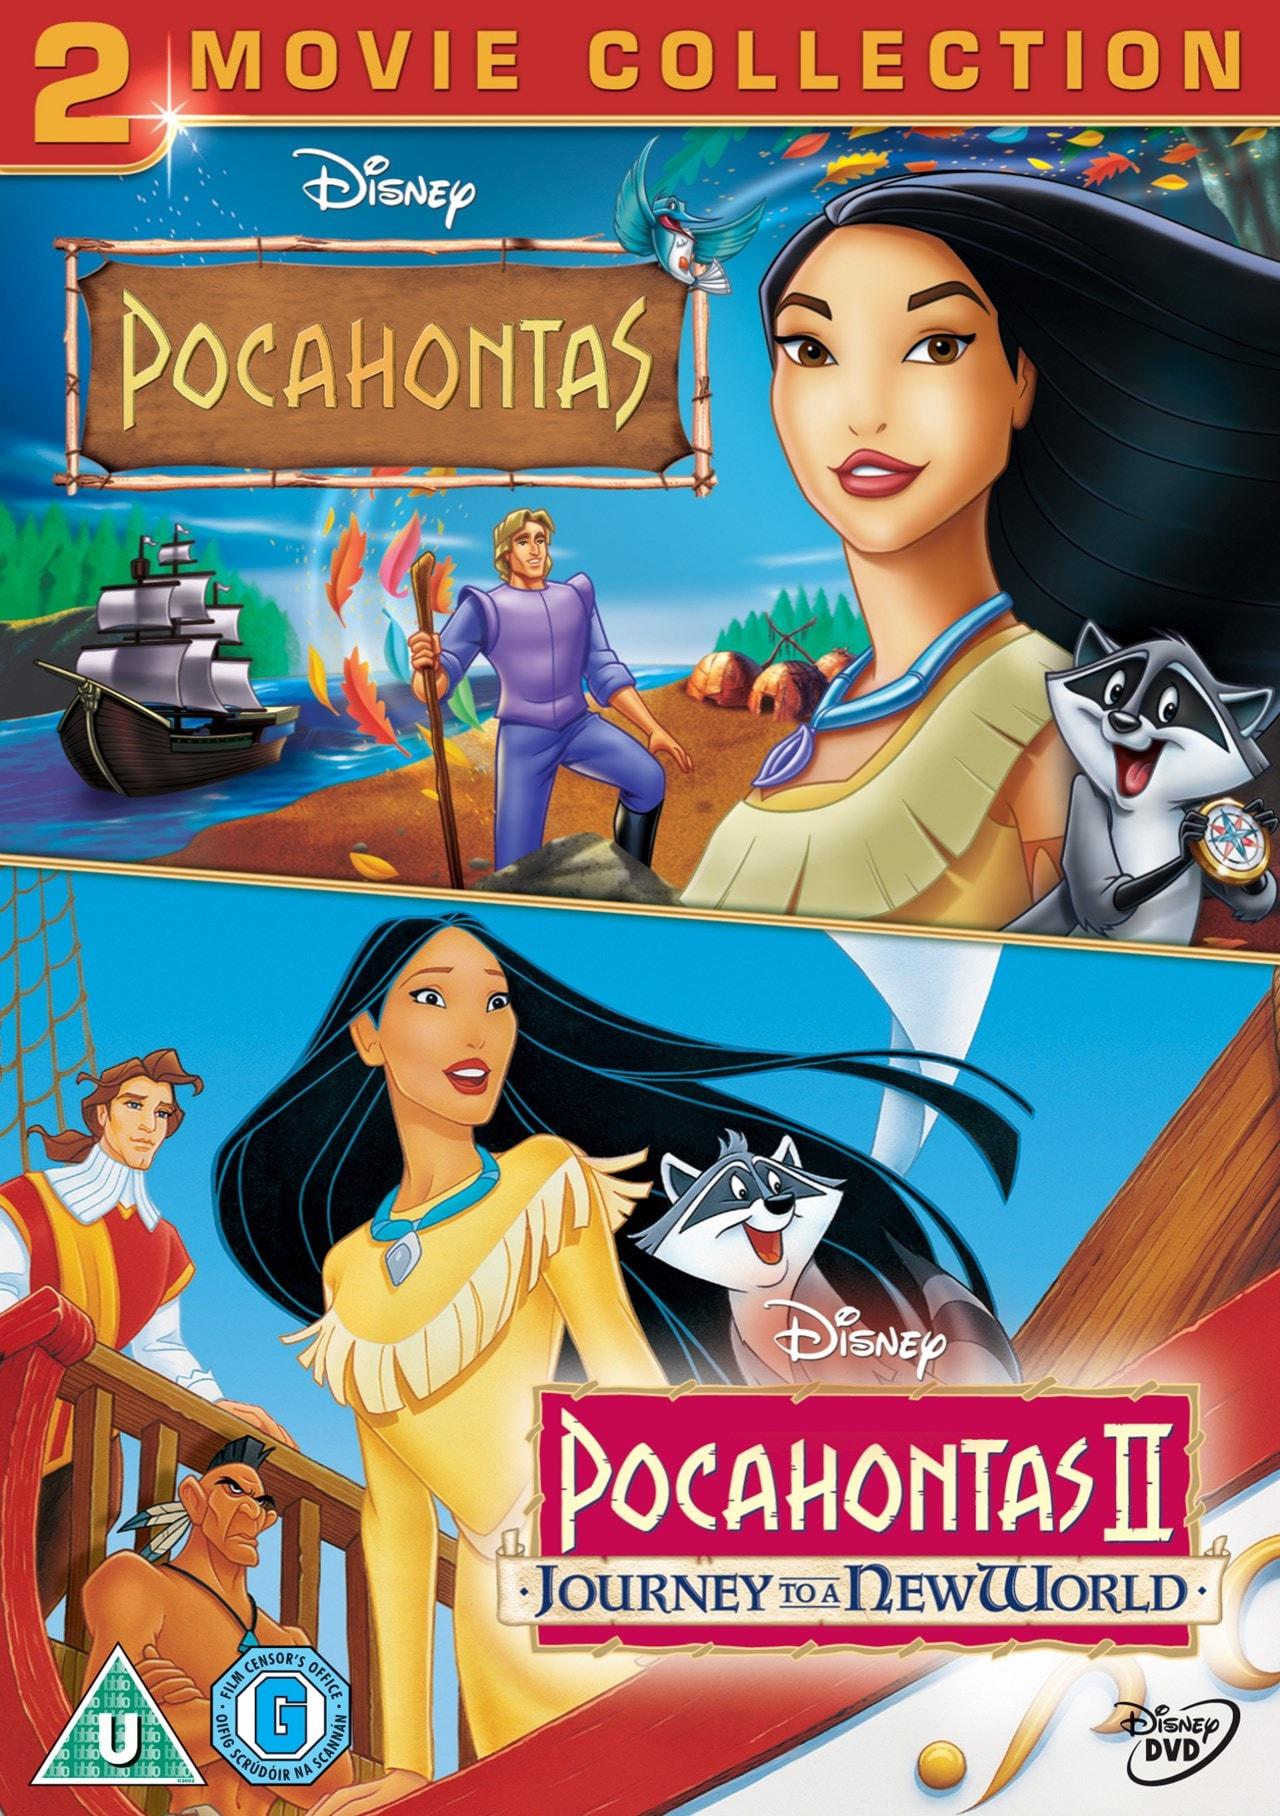 Pocahontas/Pocahontas II - Journey to a New World - 1